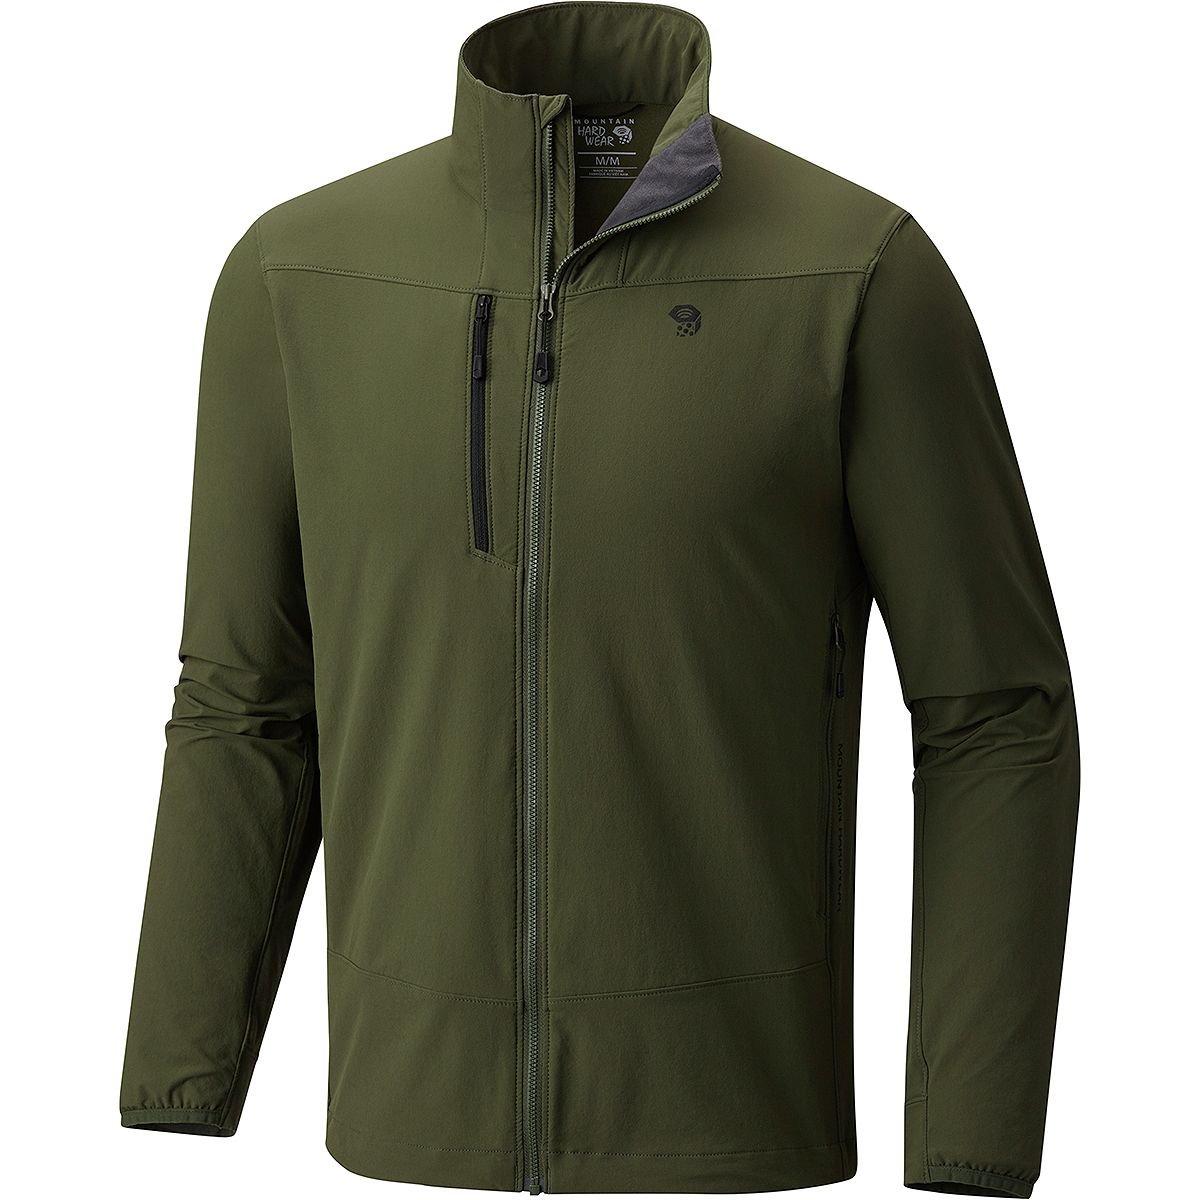 Mountain Hardwear Super Chockstone Jacket – Men 's B079H1GCMC X-Large|サープラスグリーン(Surplus Green) サープラスグリーン(Surplus Green) X-Large